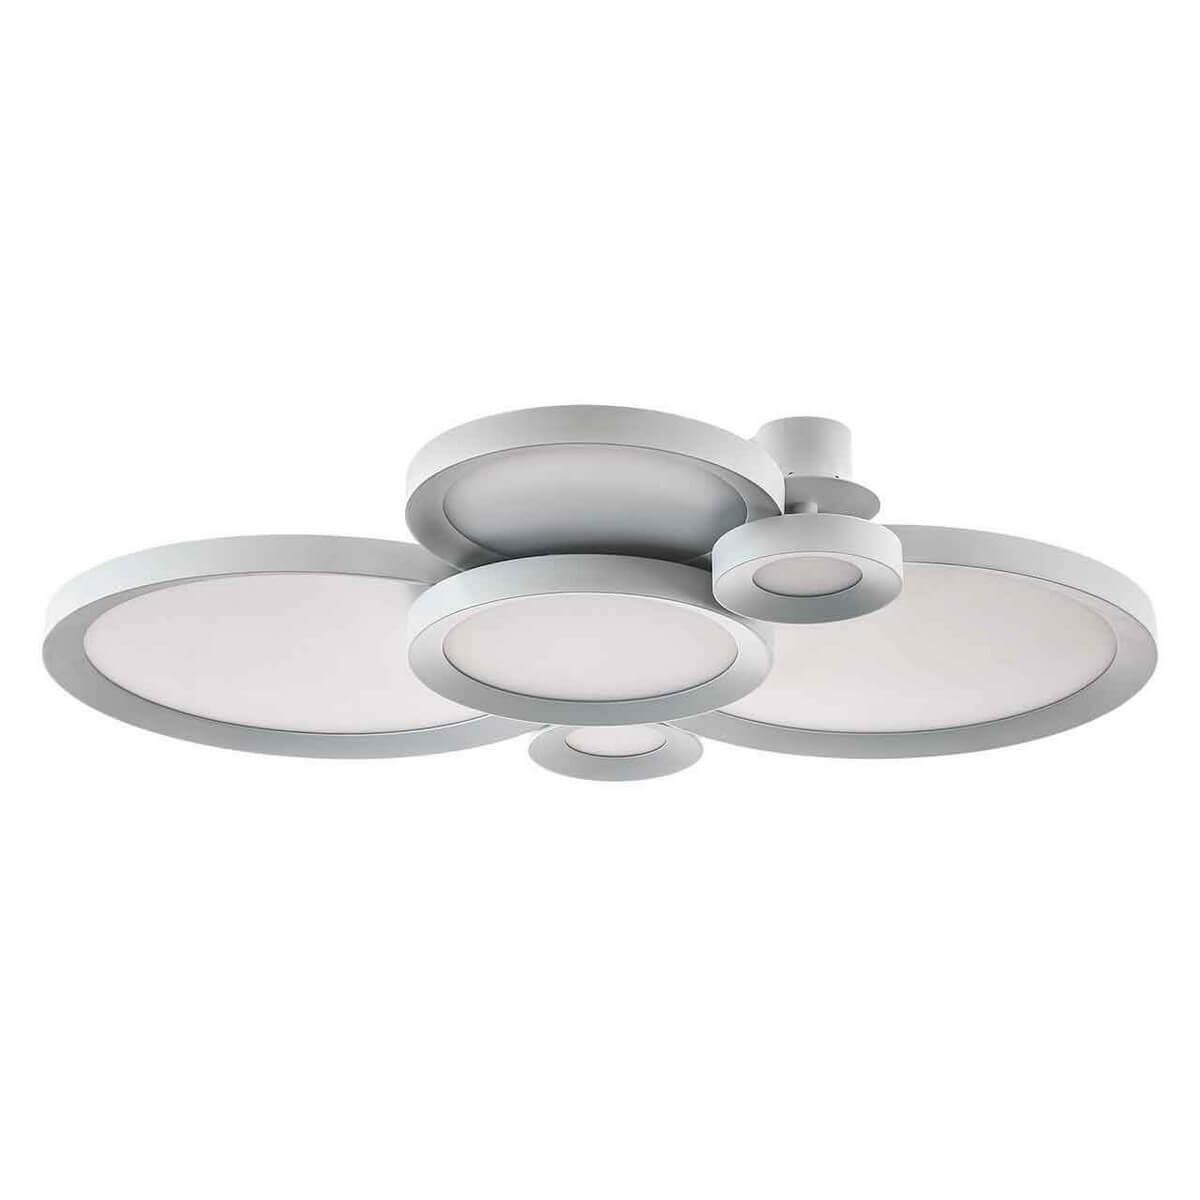 Потолочный светодиодный светильник Lightstar Breve 749082 бра lightstar breve 749612